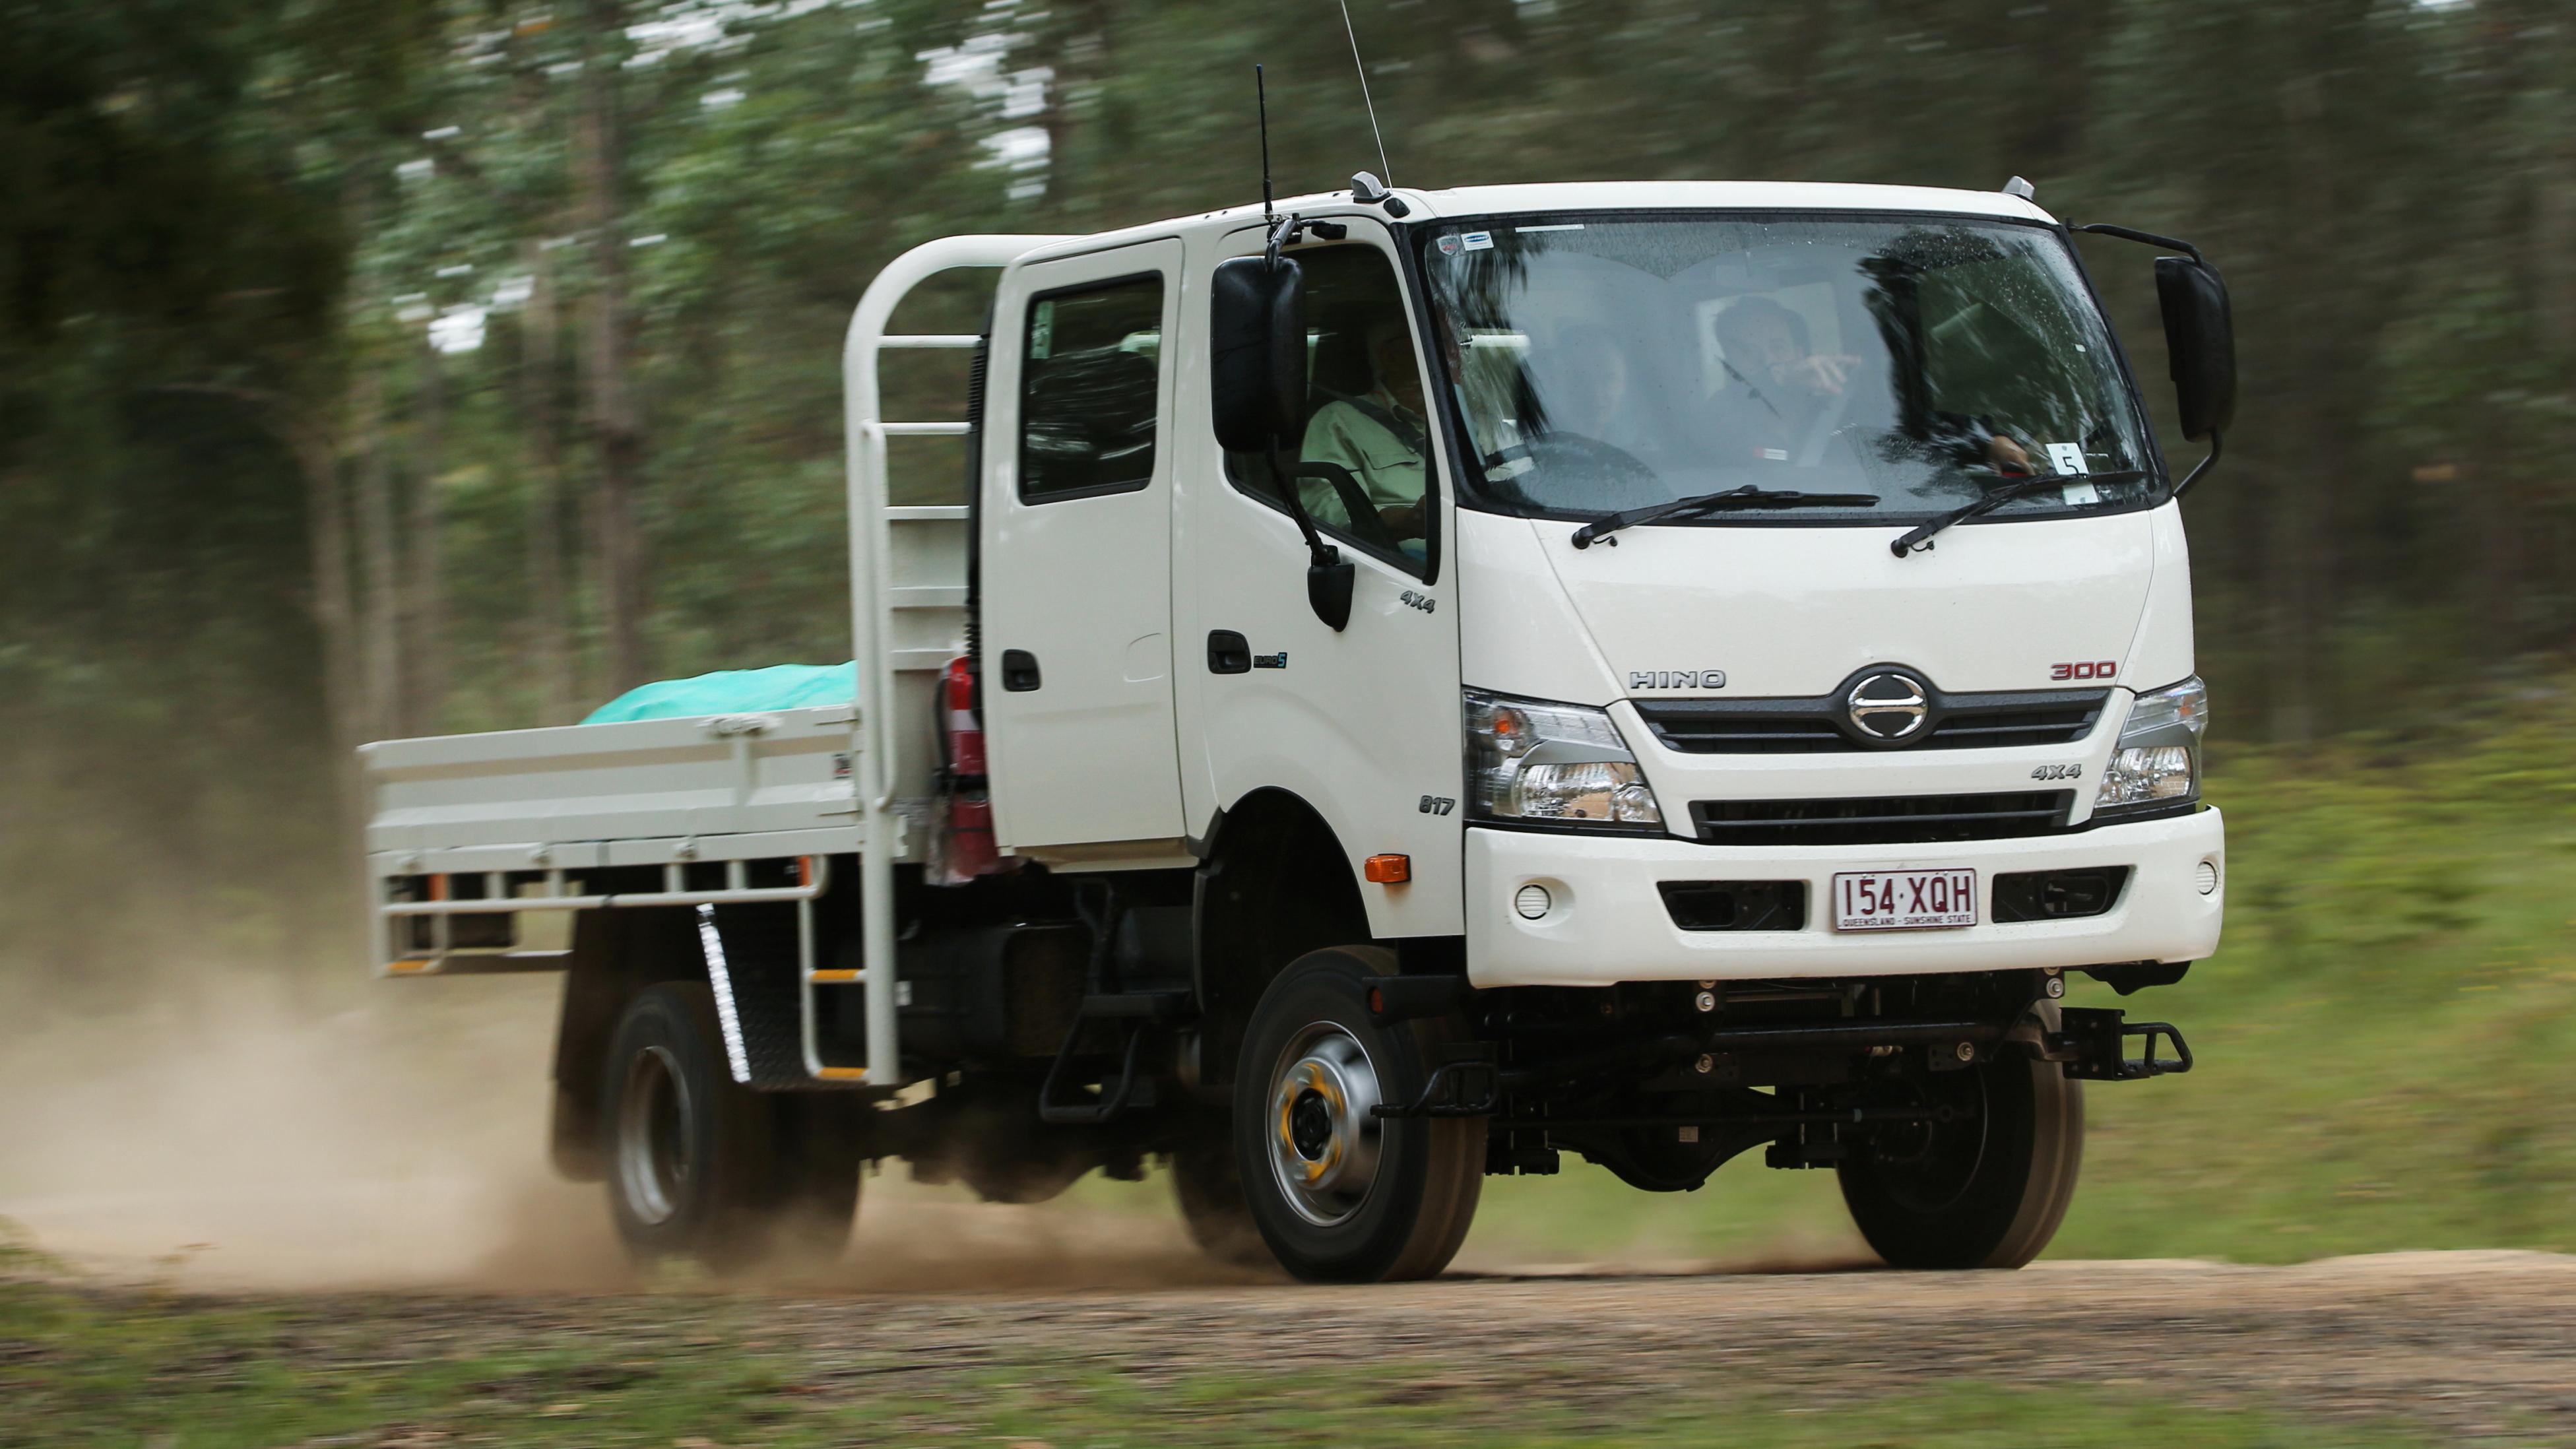 2019 Hino 300 817 4x4 review | CarAdvice